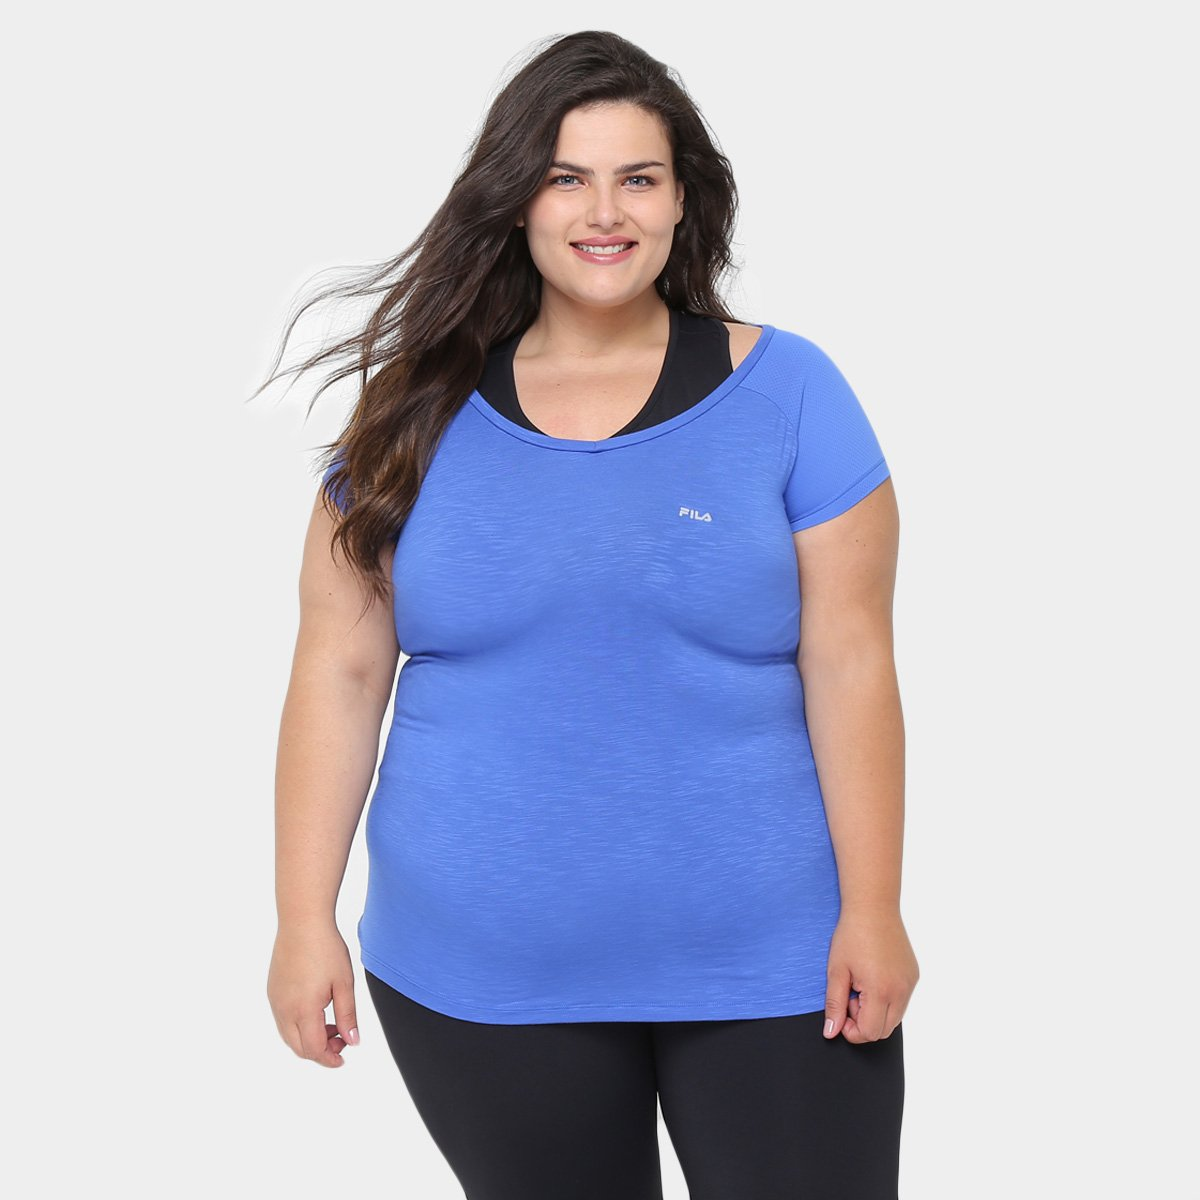 Azul Camiseta Plus Fila Match Fila Feminina Match Size Camiseta Size Plus rqrvp